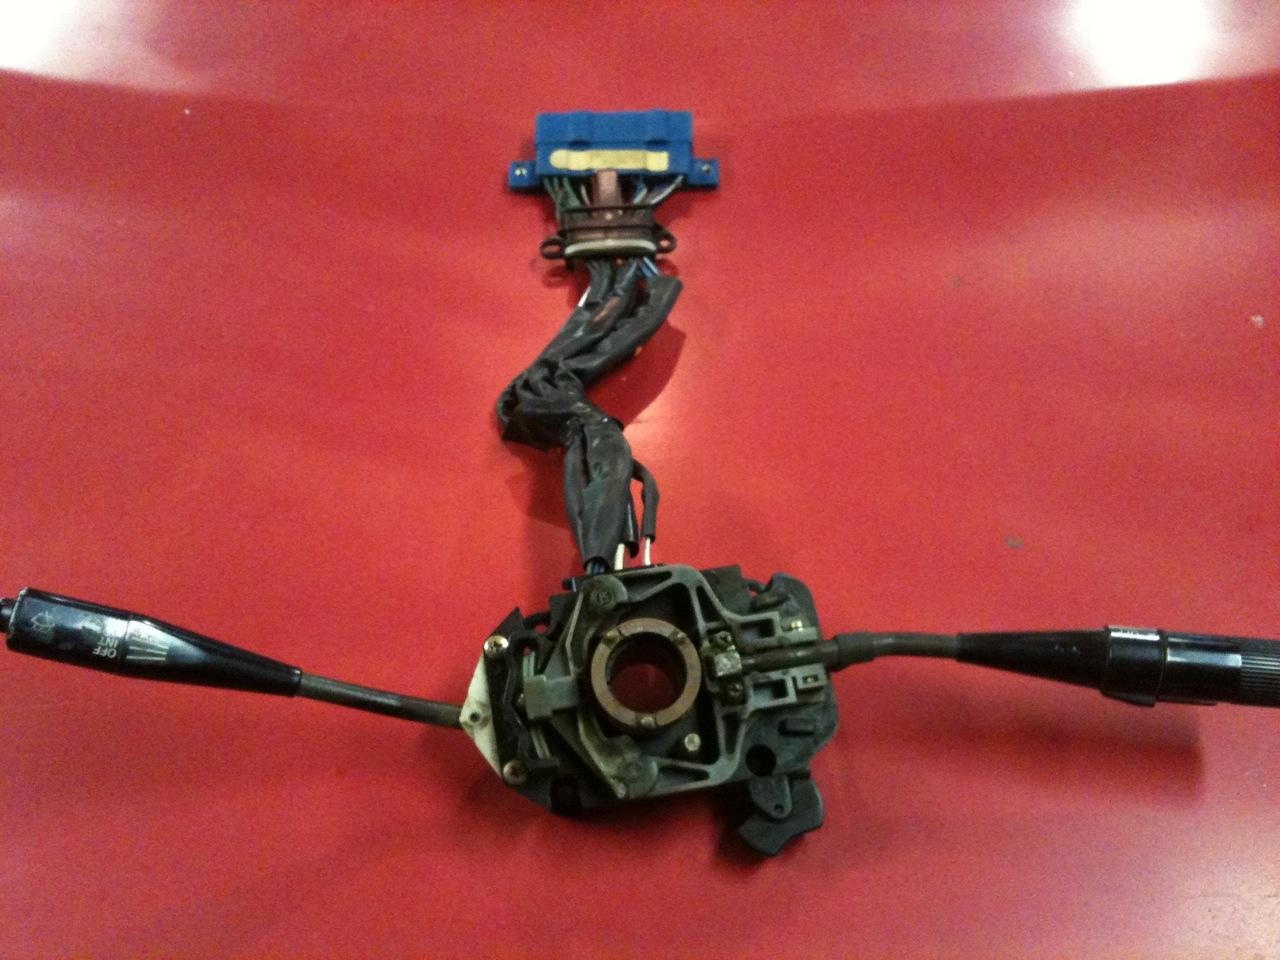 Landcruiser Parts for Sale: FJ60 Steering column turn signal